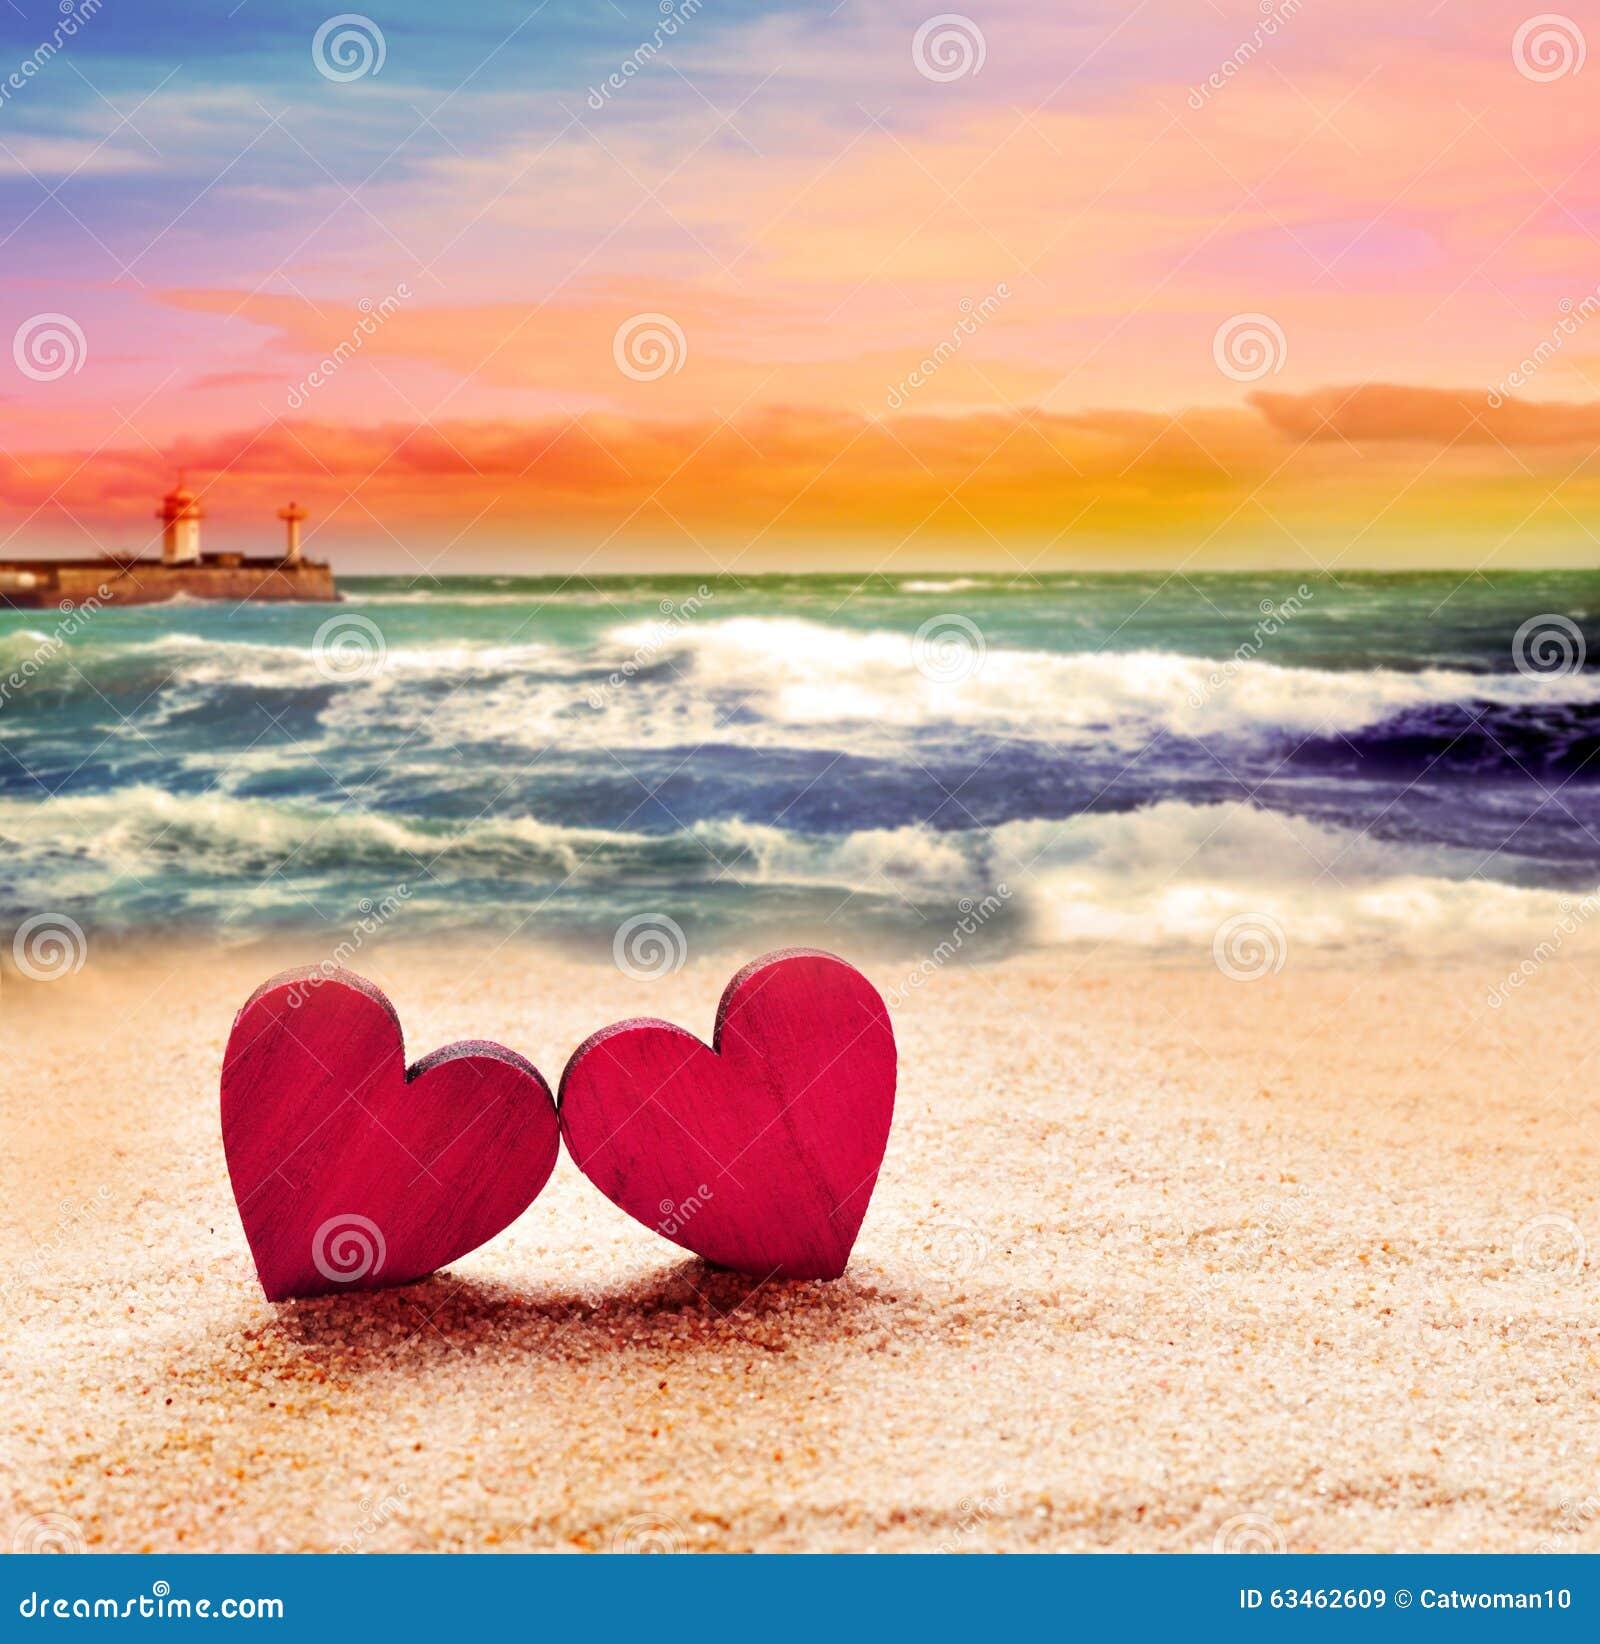 Romantic couple closeup with a creamy climax 4